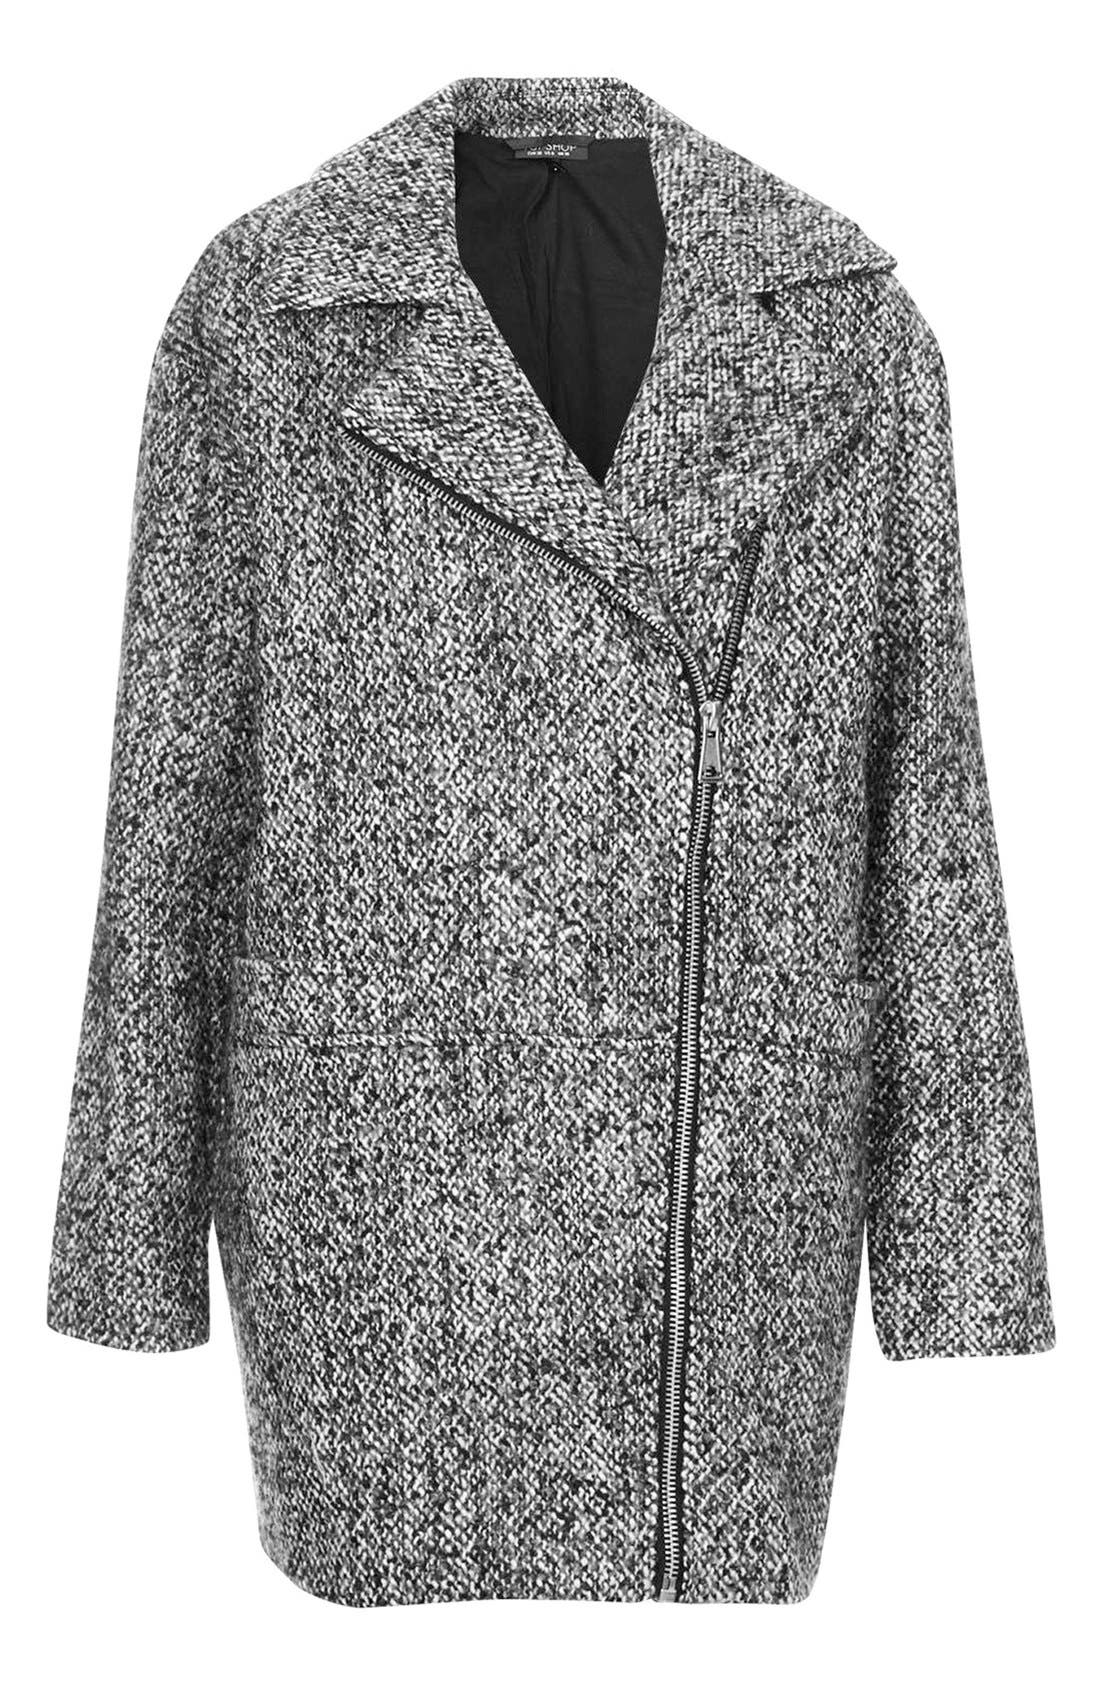 Alternate Image 3  - Topshop Textured Wool Jacket